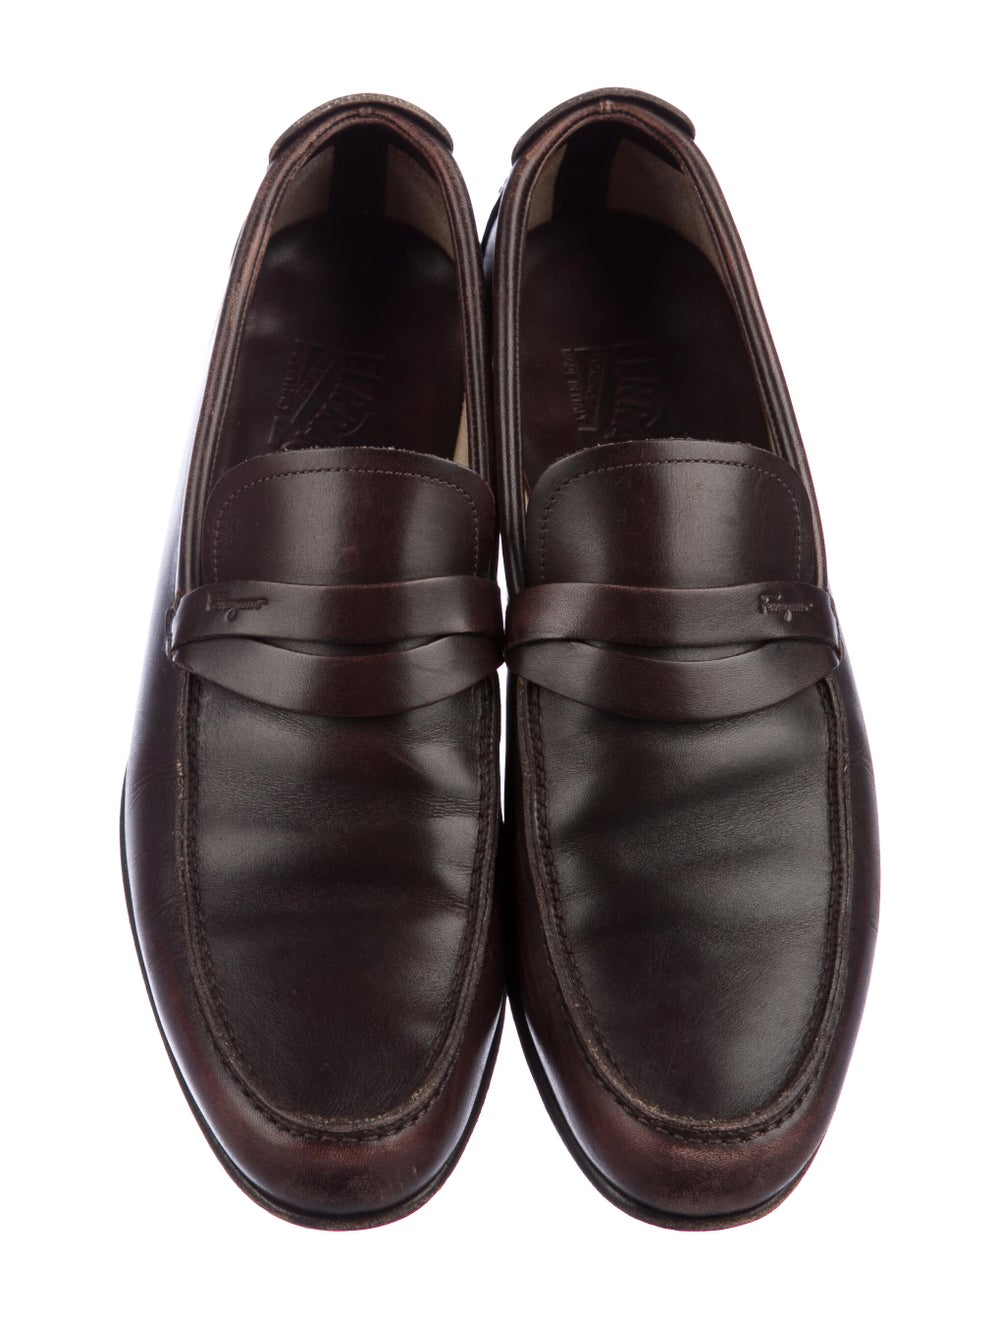 Salvatore Ferragamo Leather Penny Loafers - image 3